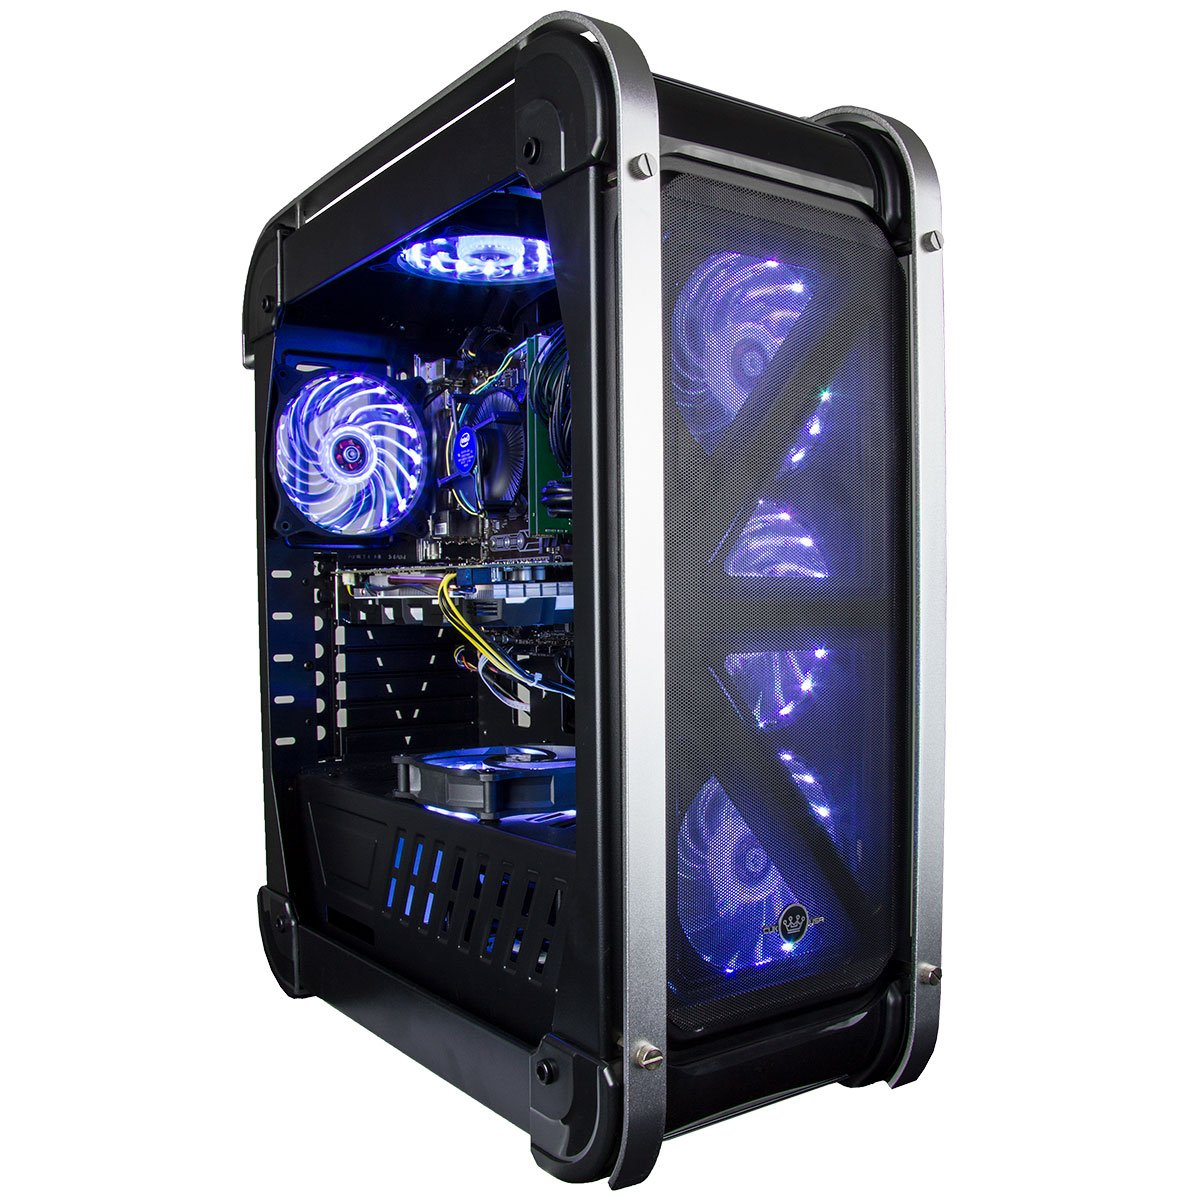 CUK Switch 77 - Gamer VR Ready Desktop (Intel Core i7-7700, 16GB RAM DDR4, 256GB Nytro SSD + 2TB HDD, NVIDIA GTX 1080 8GB, 400W PSU) Best Windows 10 Gaming Computer PC - Black by Computer Upgrade King (Image #2)